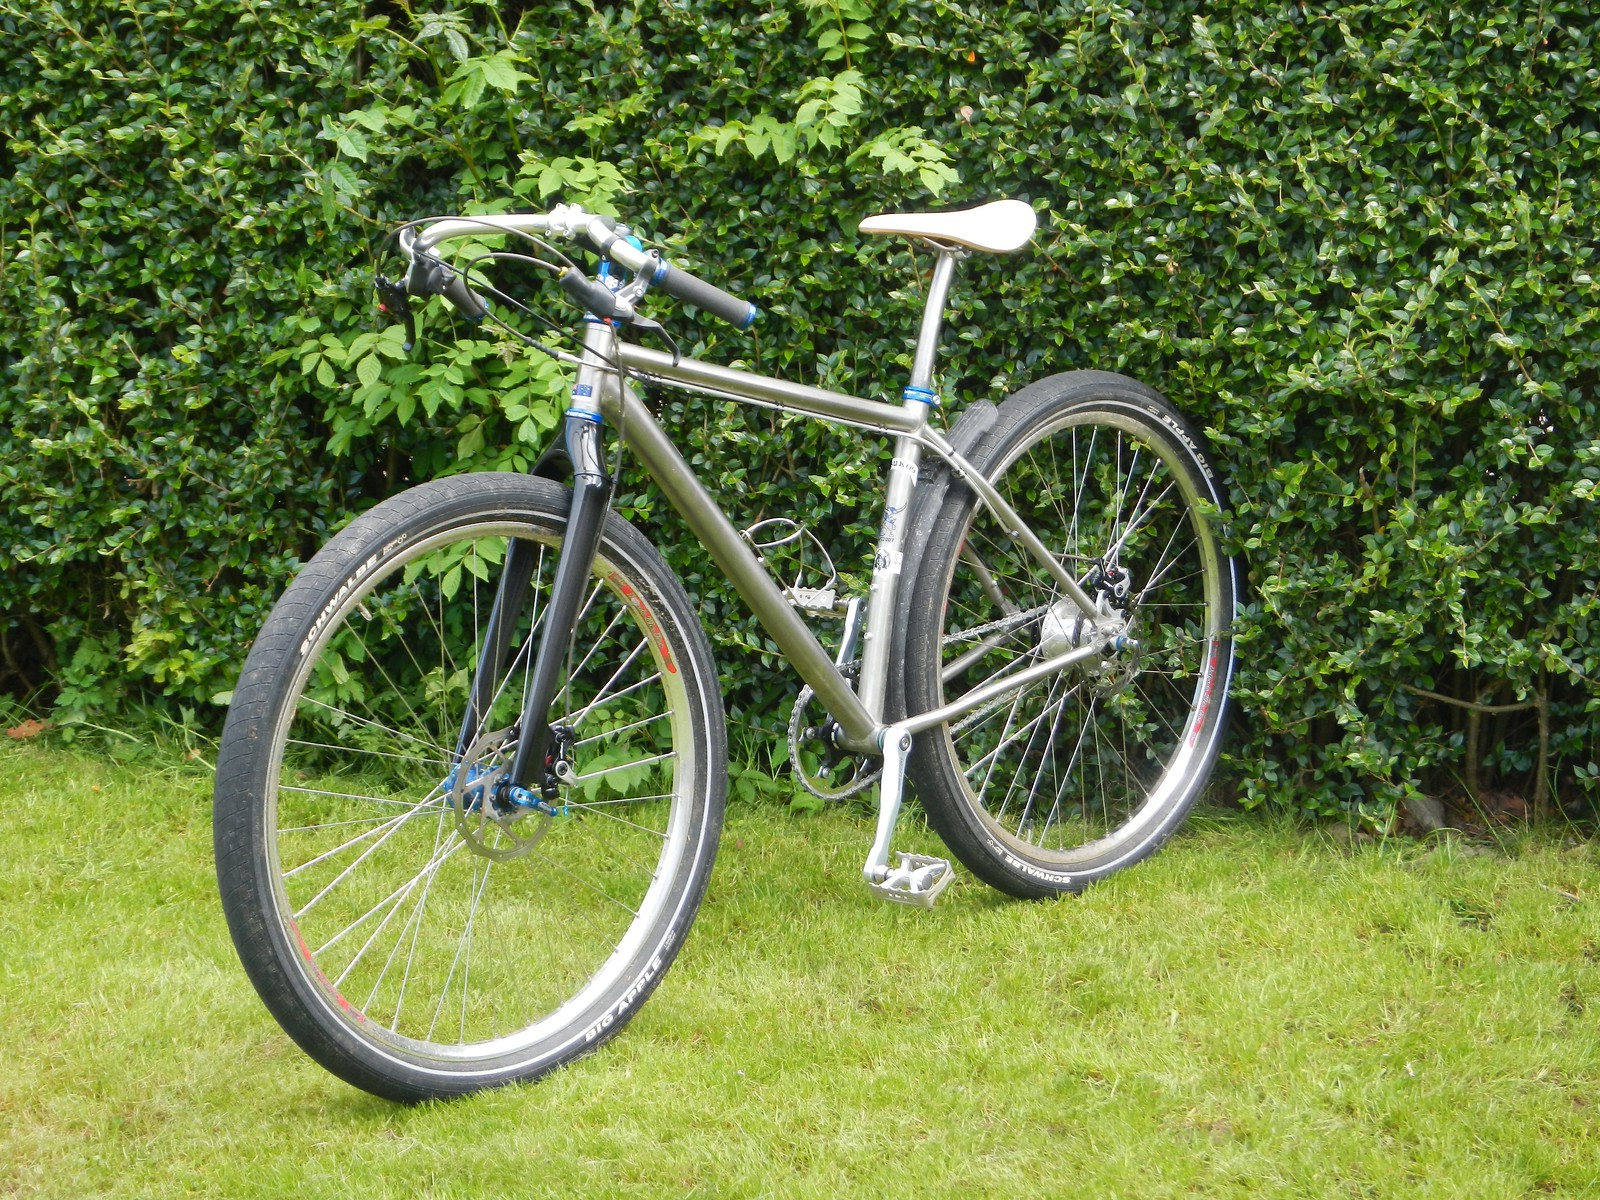 Lets Have A Quot Show Off Your Gravel Bike Quot Thread